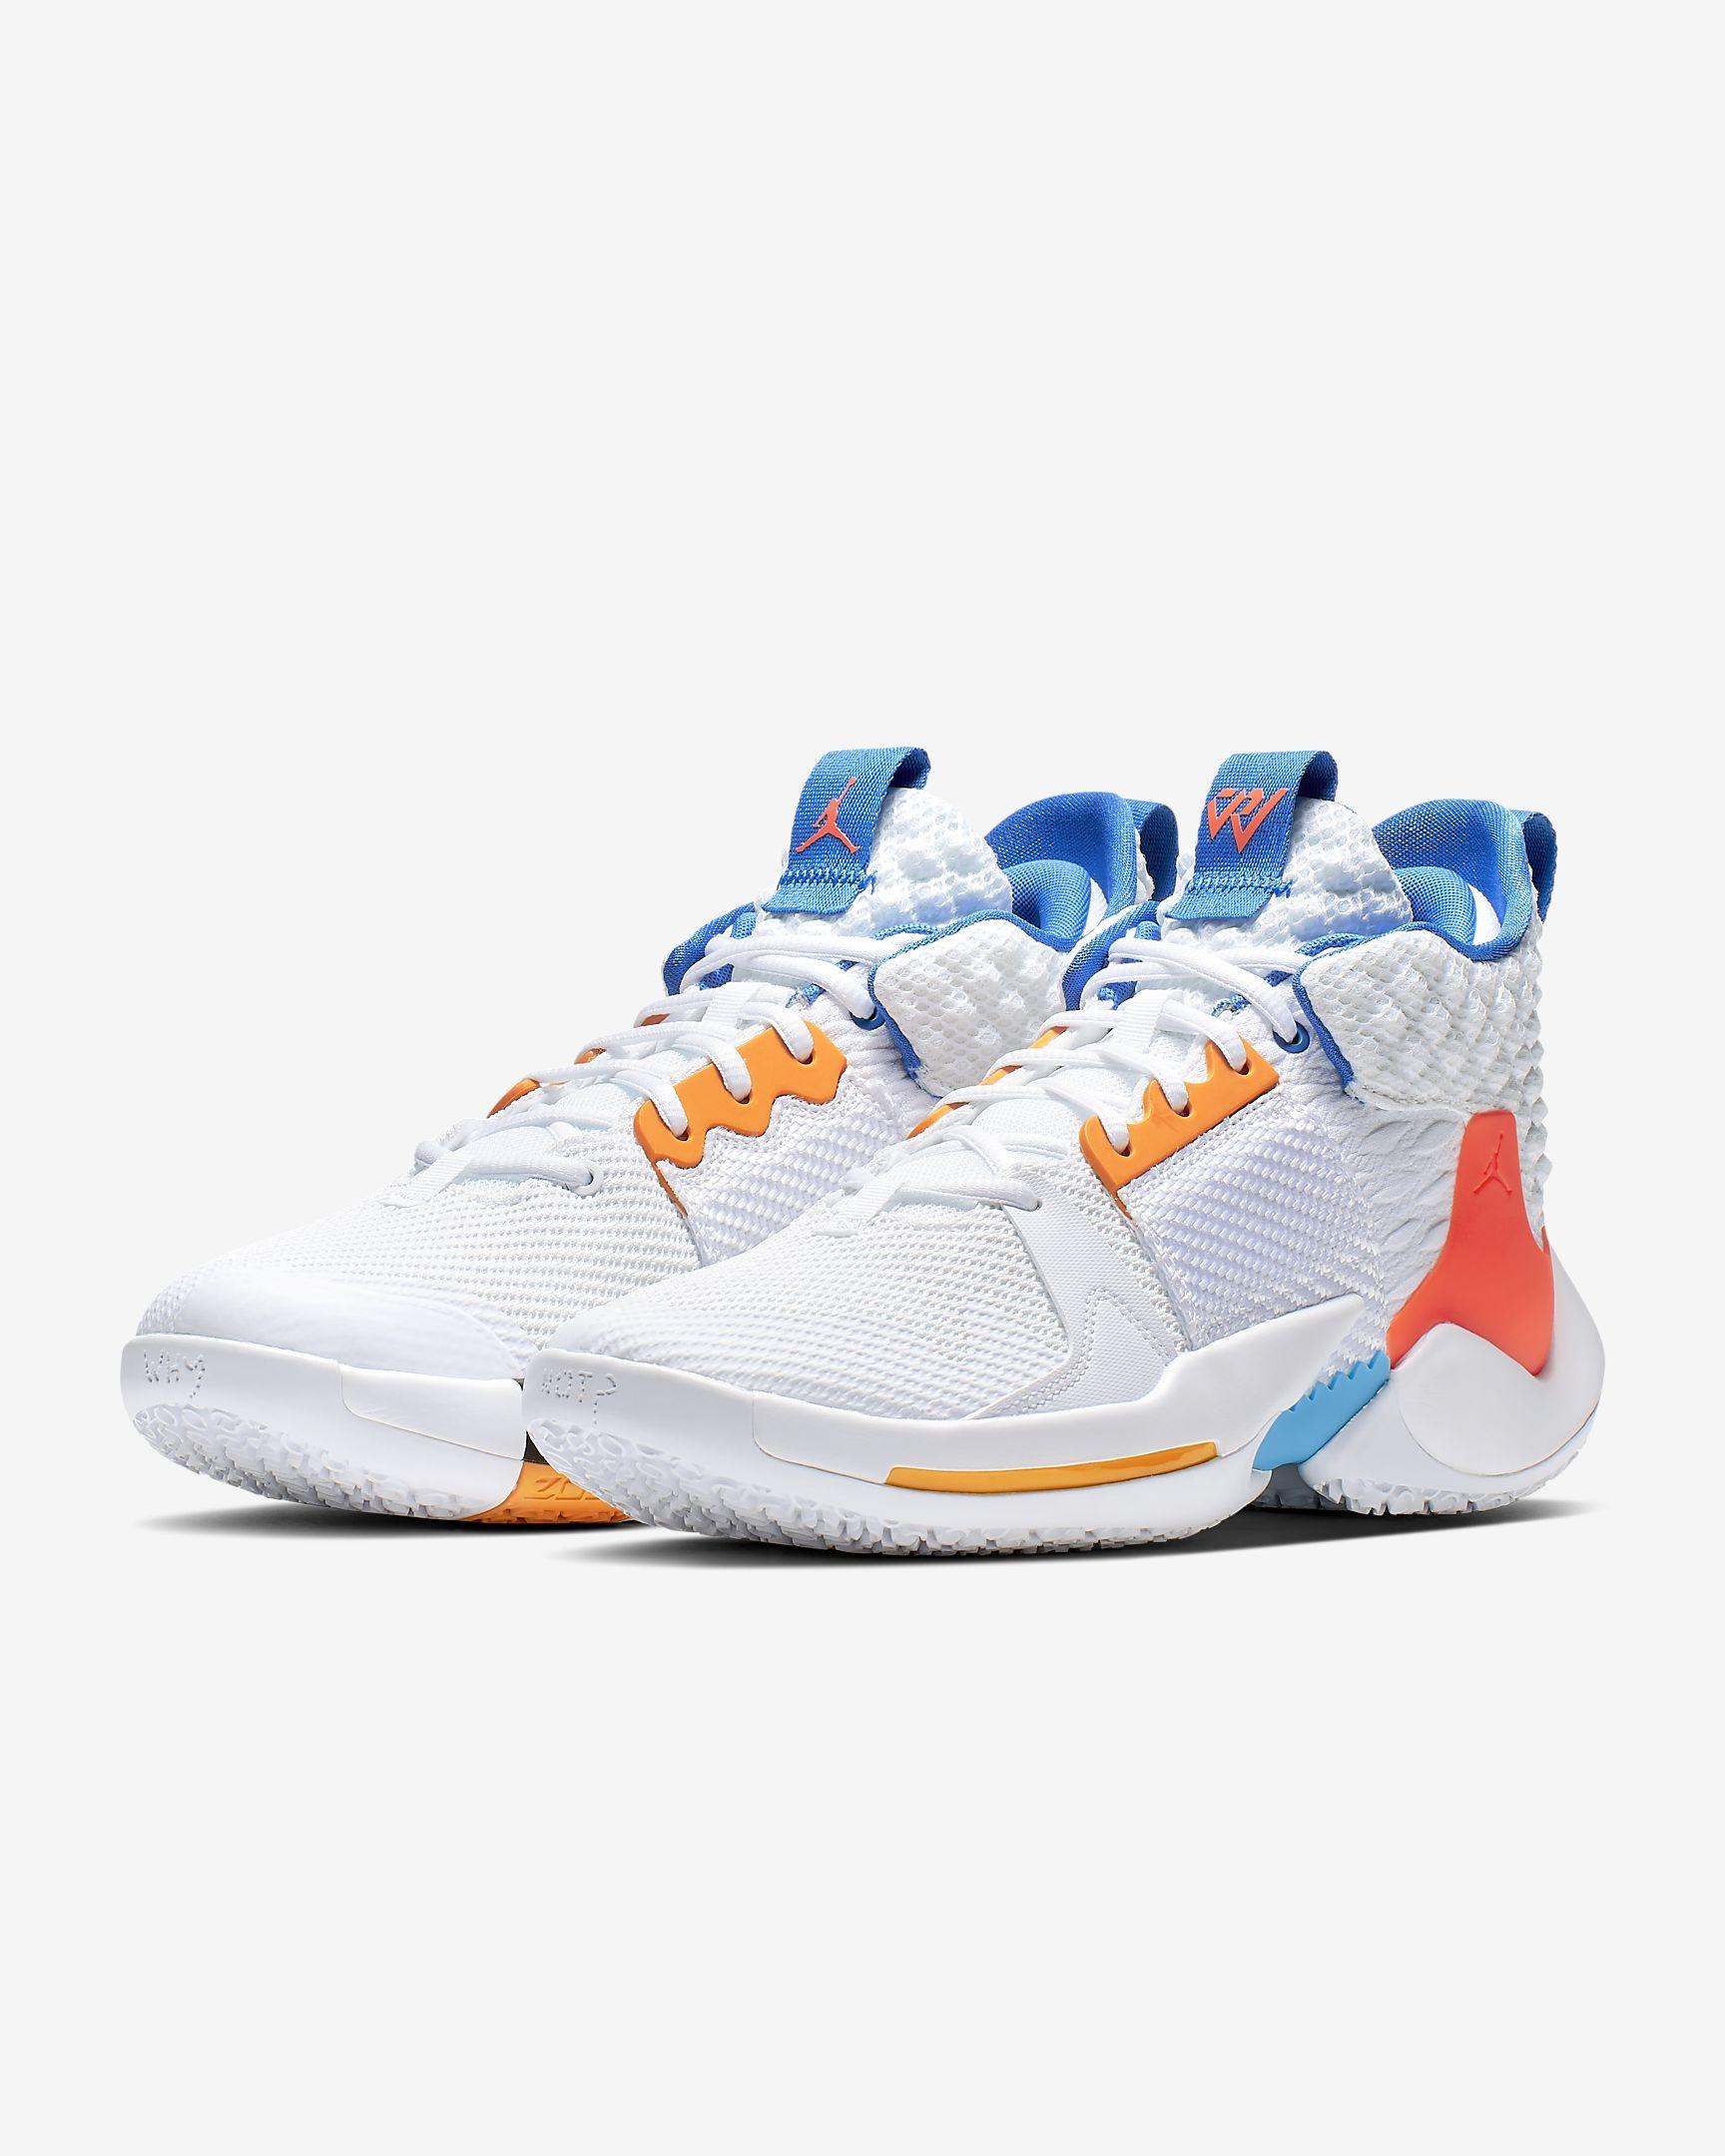 wholesale online shopping popular brand Nike Men's Basketball Shoe Jordan Why Not? Zer0.2 in 2019 ...